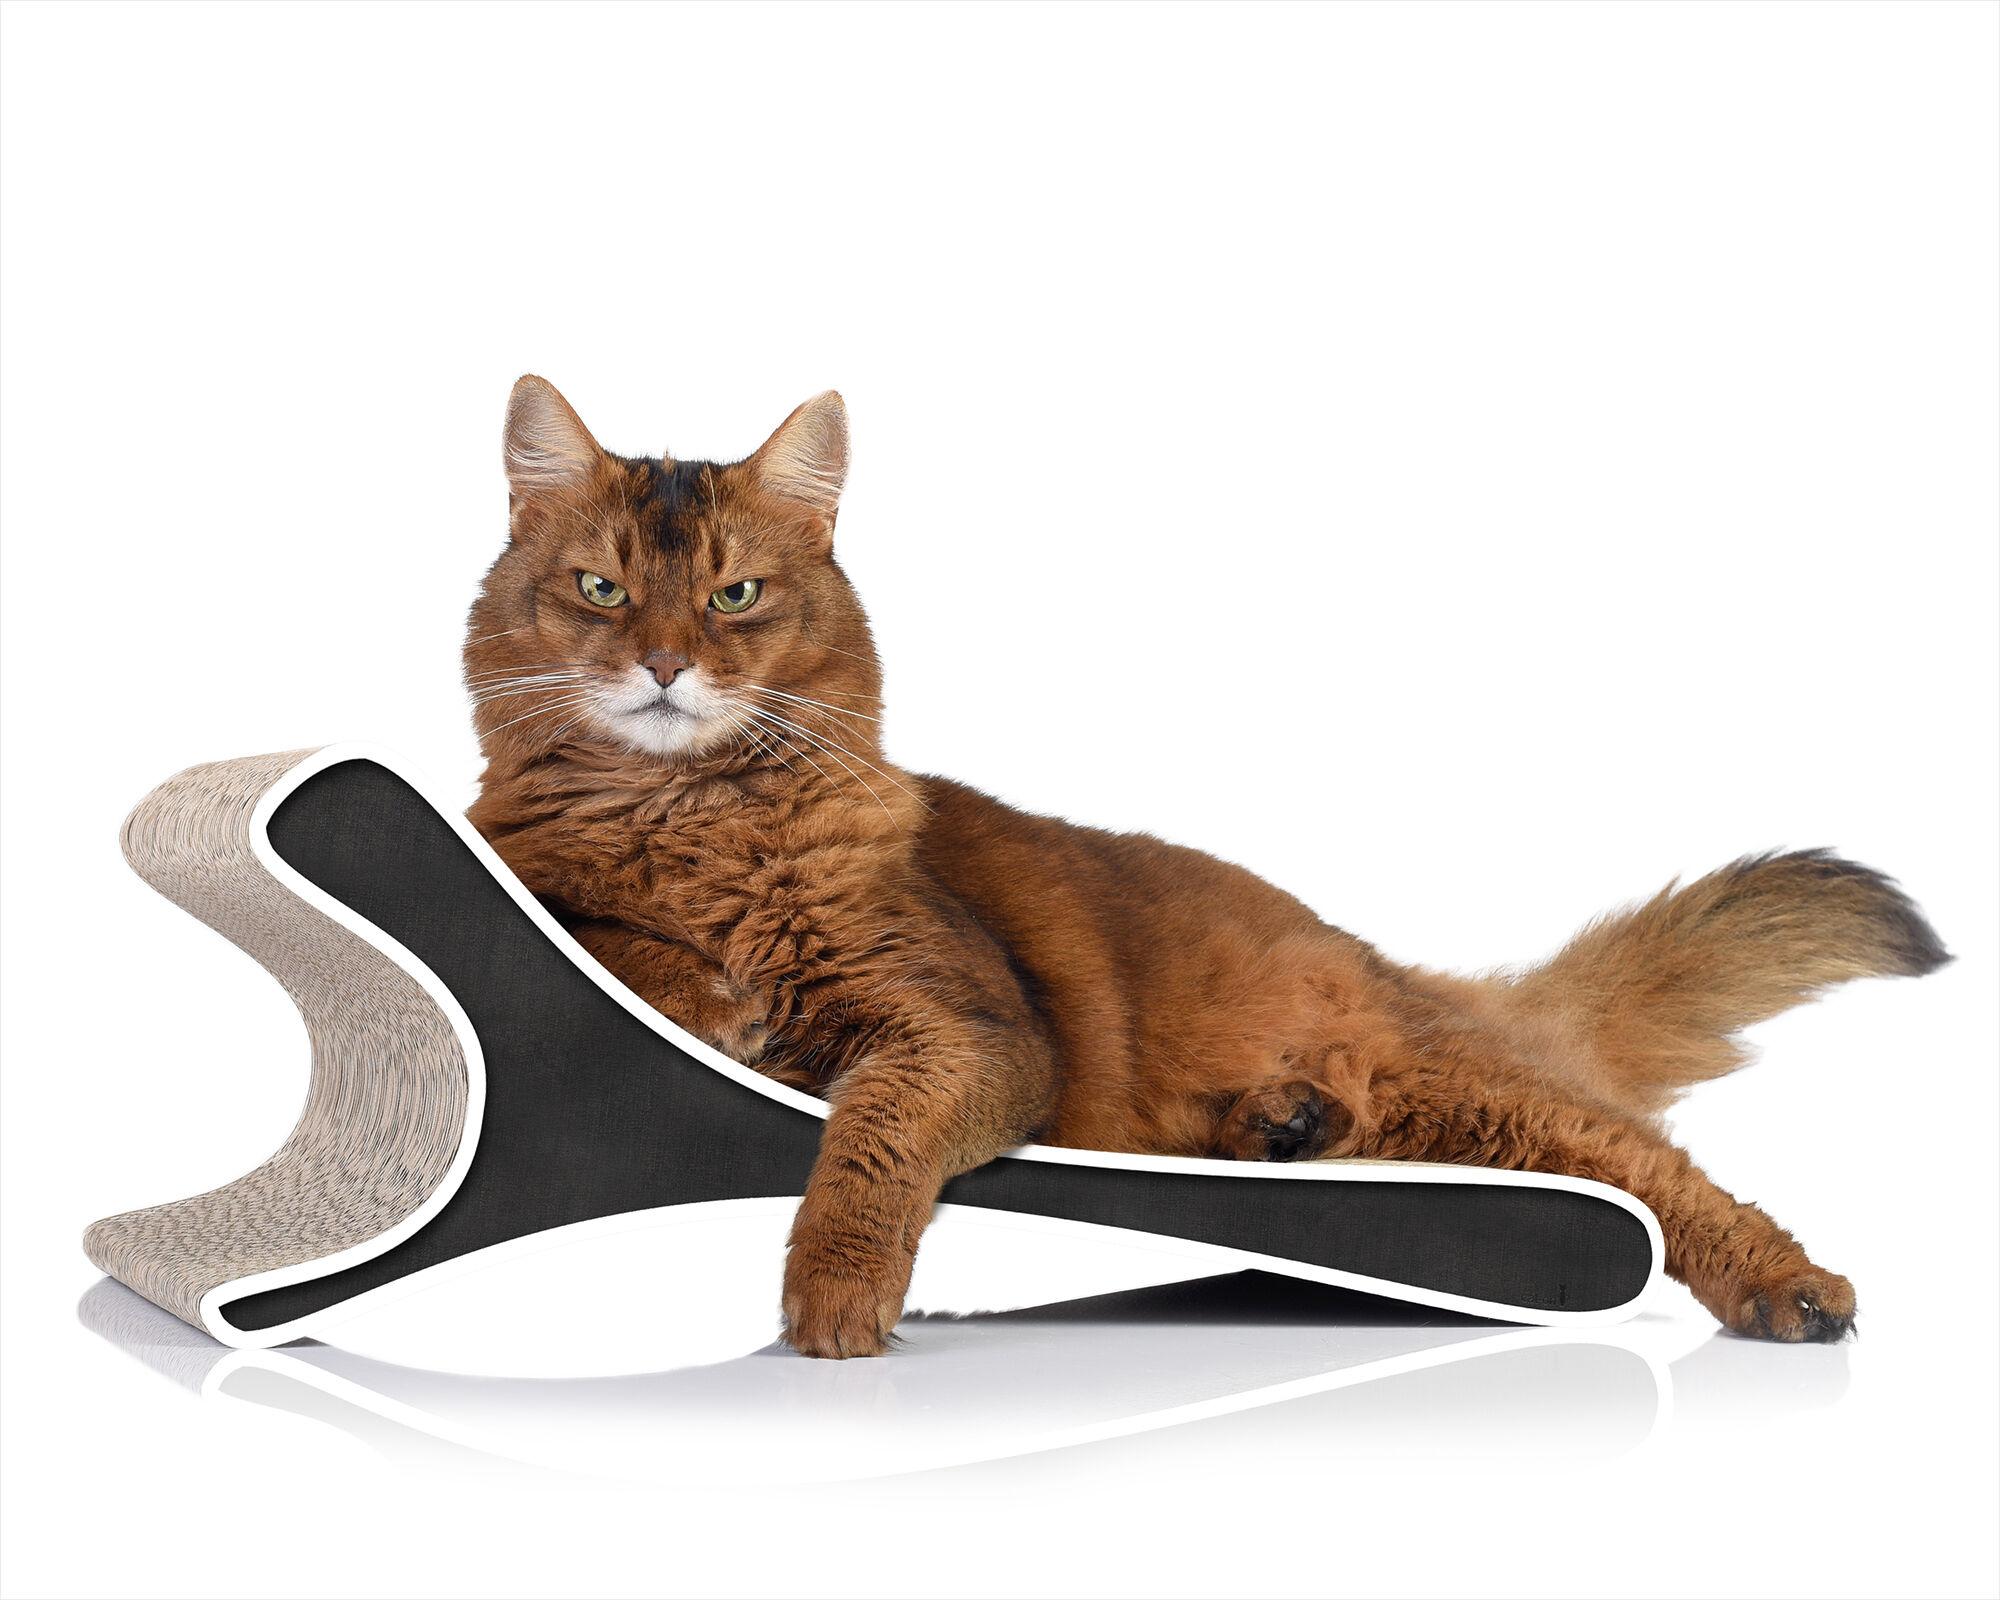 Feline cat scratcher